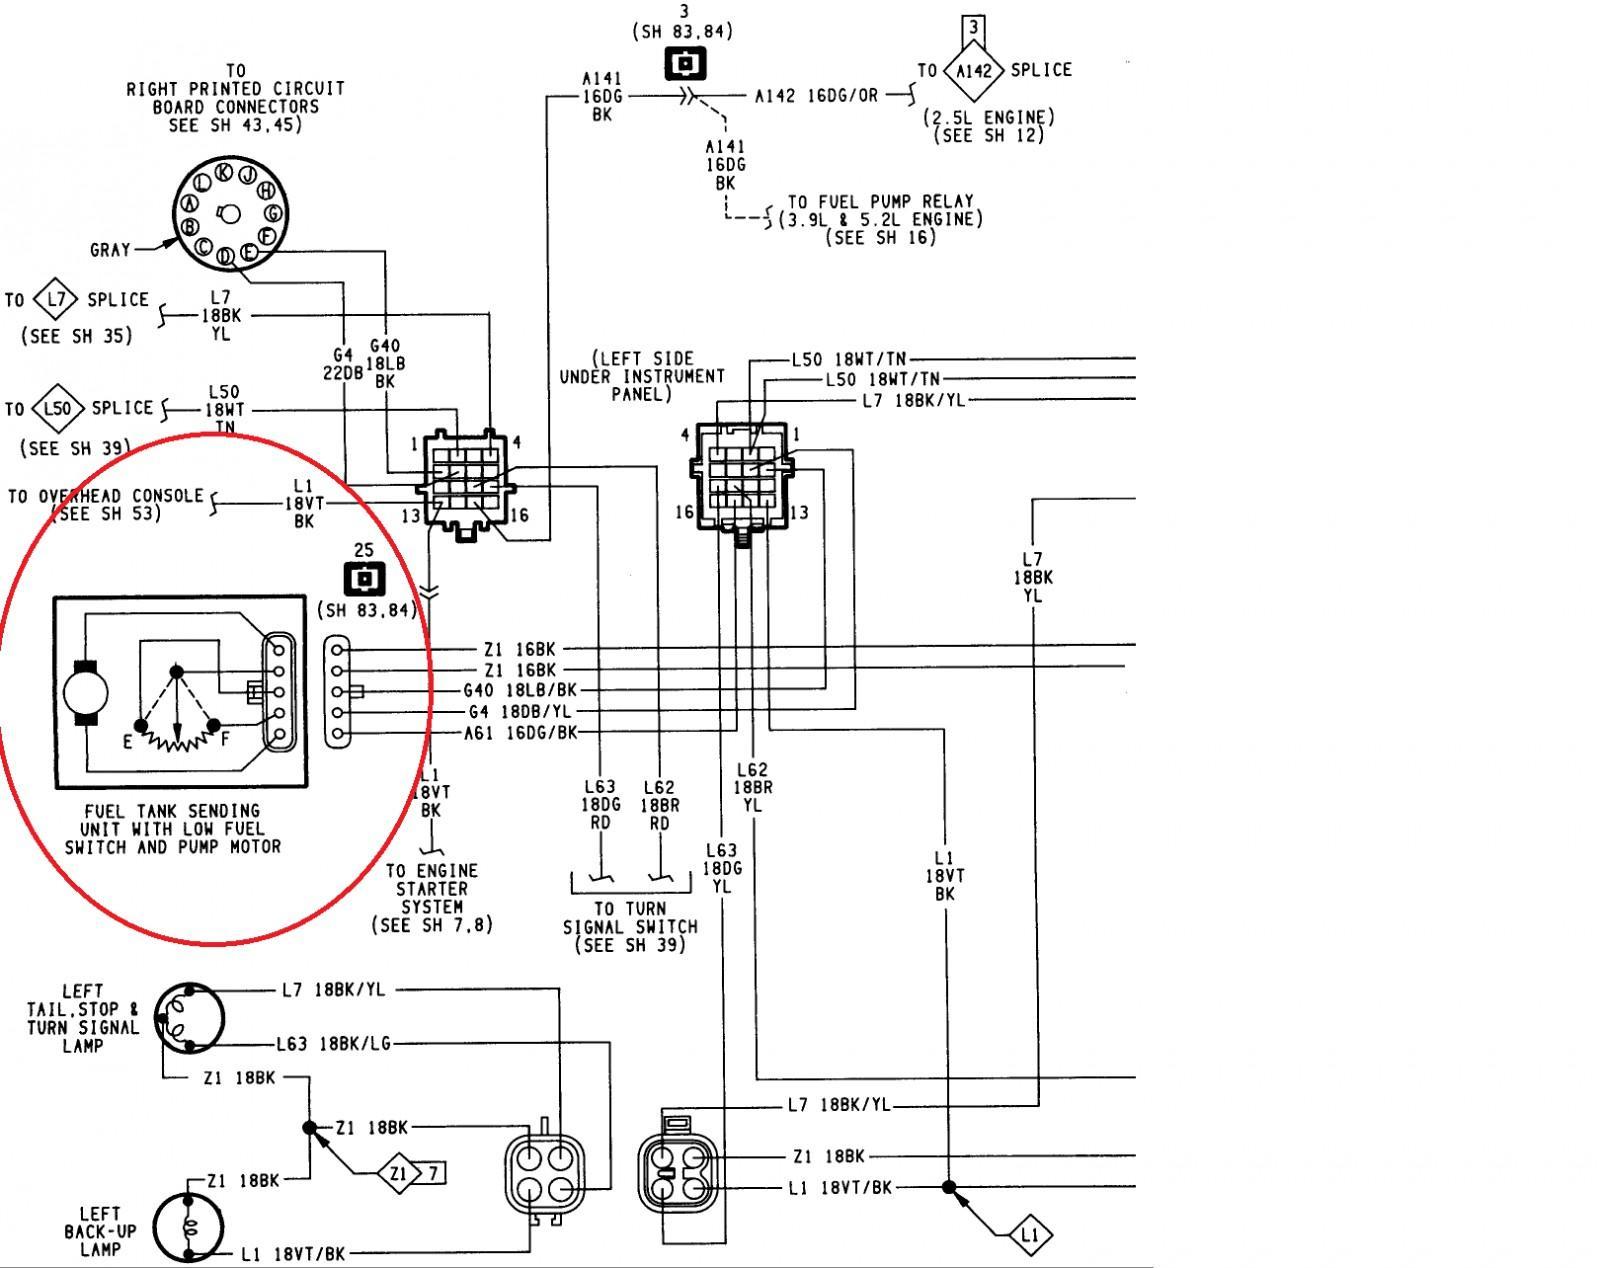 F70 Yamaha Trim Gauge Wiring - Trusted Wiring Diagram Online - Yamaha Outboard Gauges Wiring Diagram